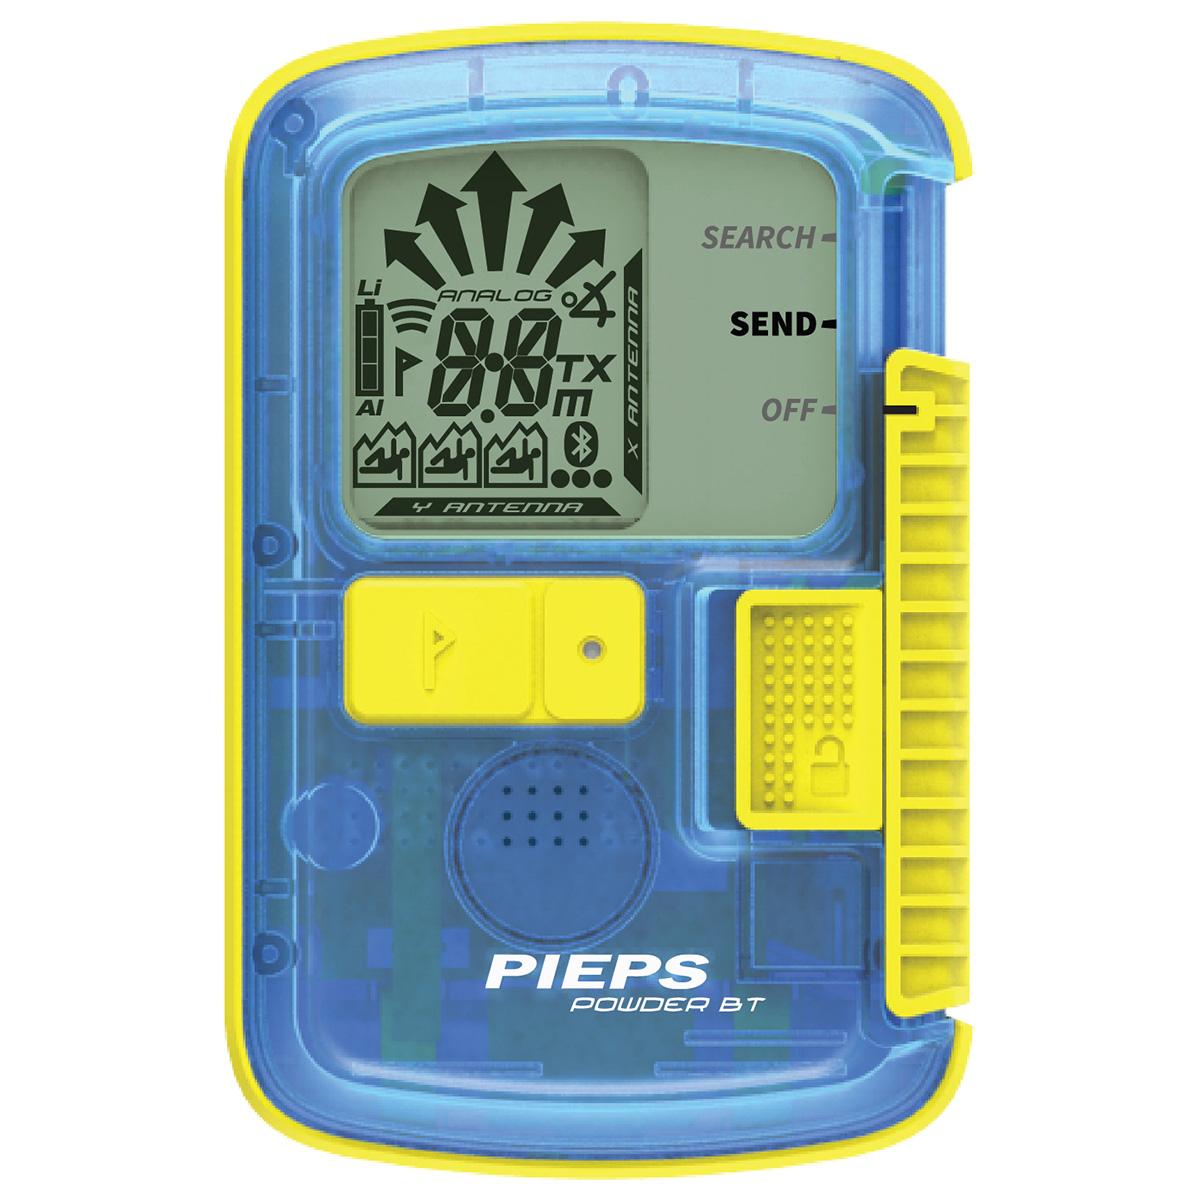 PIEPS ピープス パウダーBT (P5)